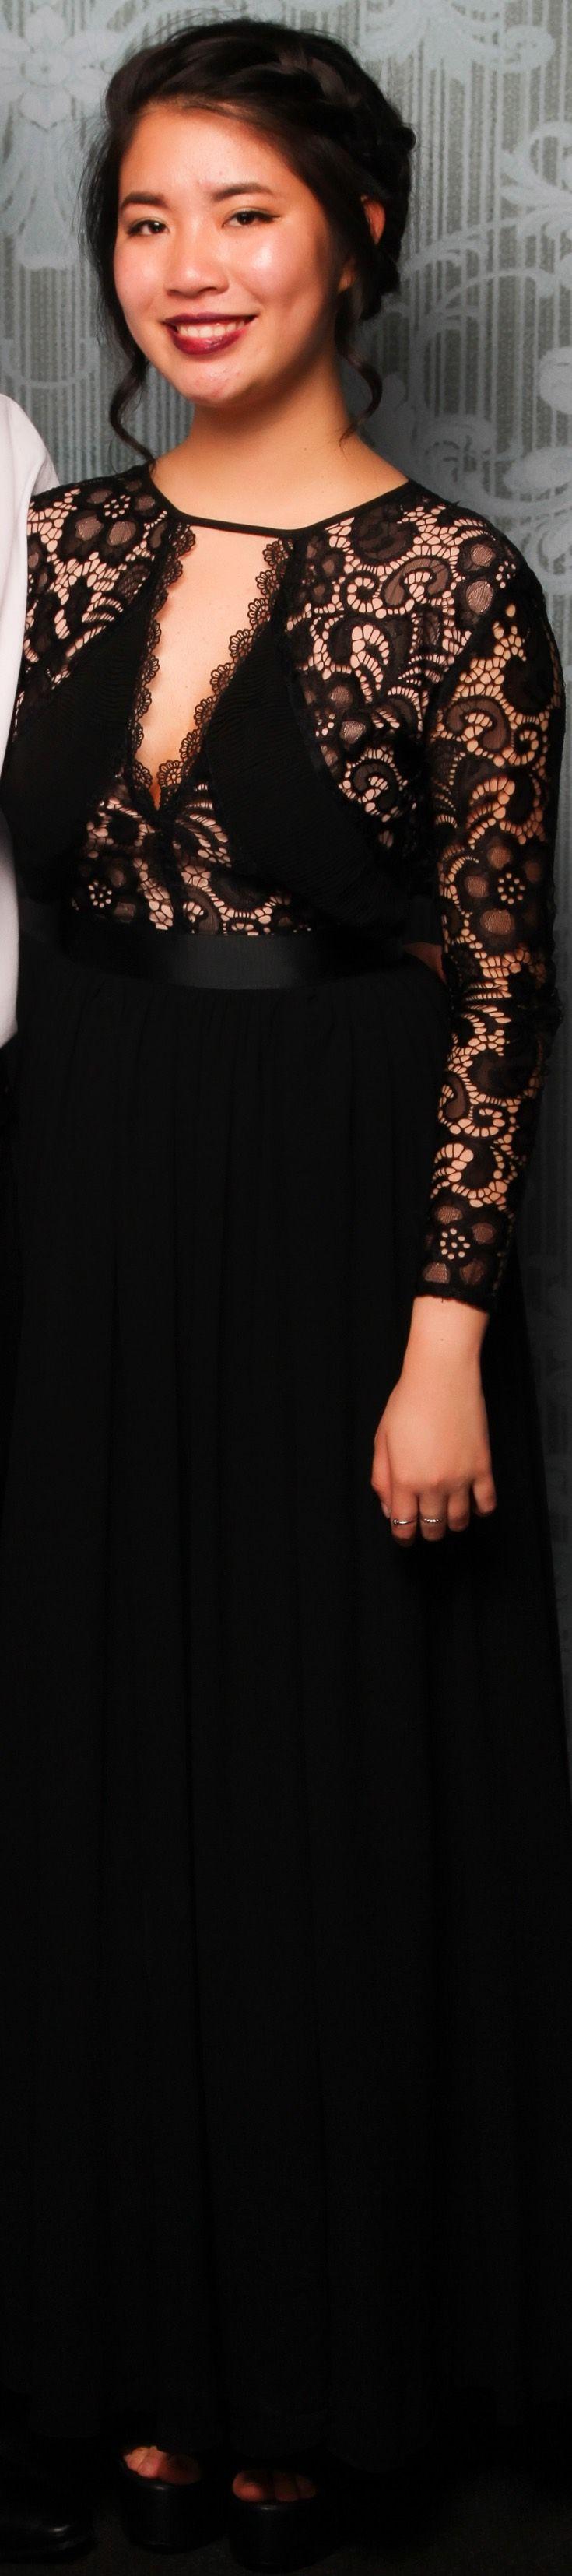 Whangaparaoa Ball 2015. Love the lace! www.whitedoor.co.nz